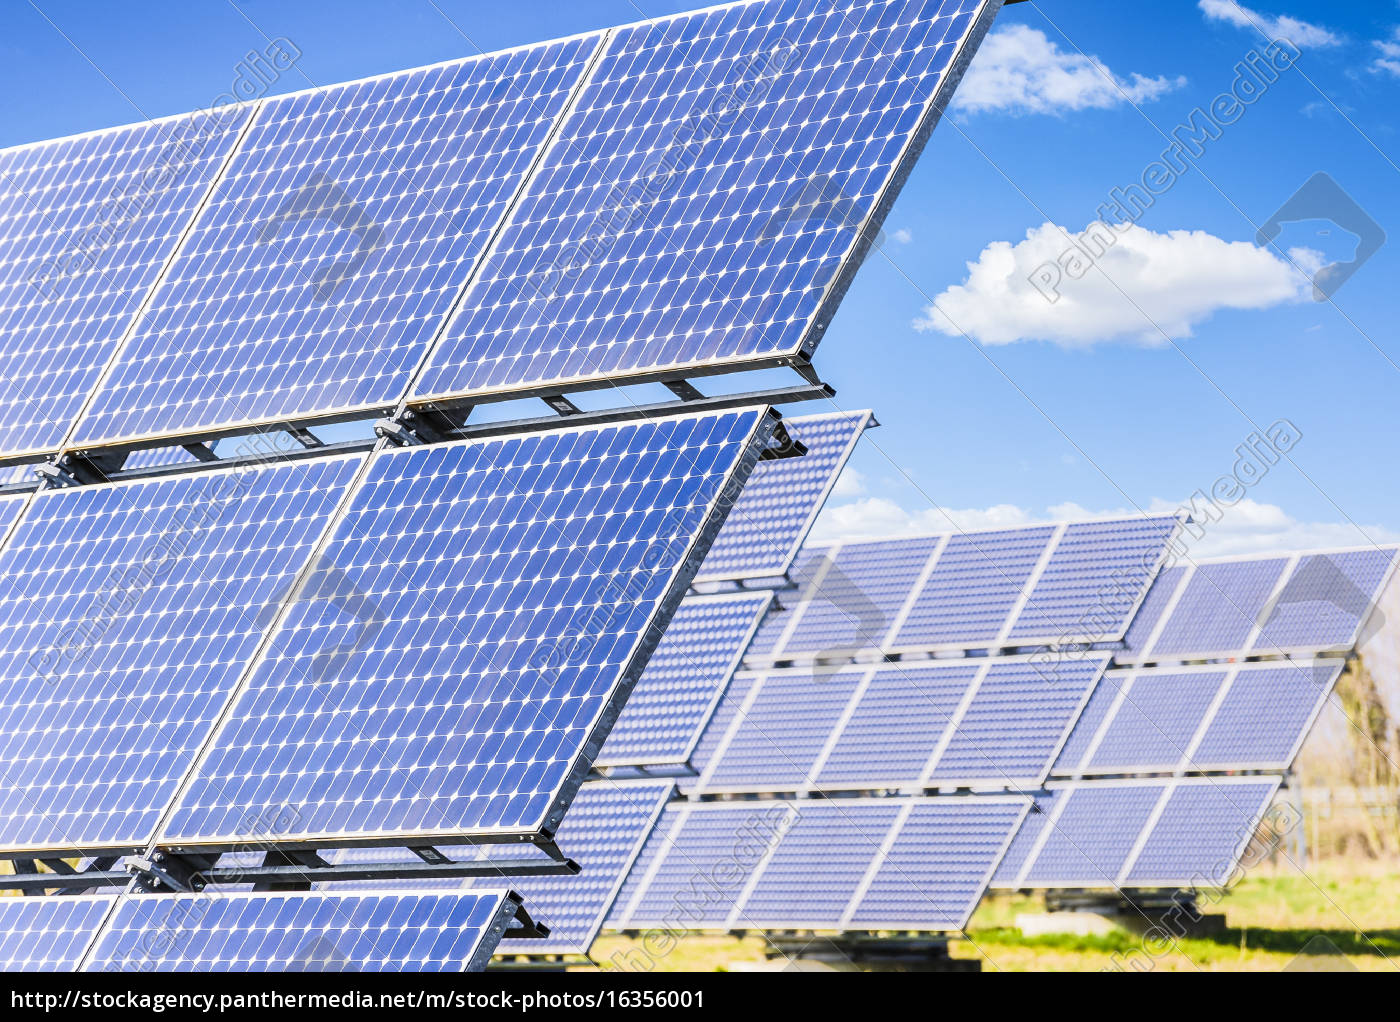 solar, panels, to, produce, green, energy - 16356001